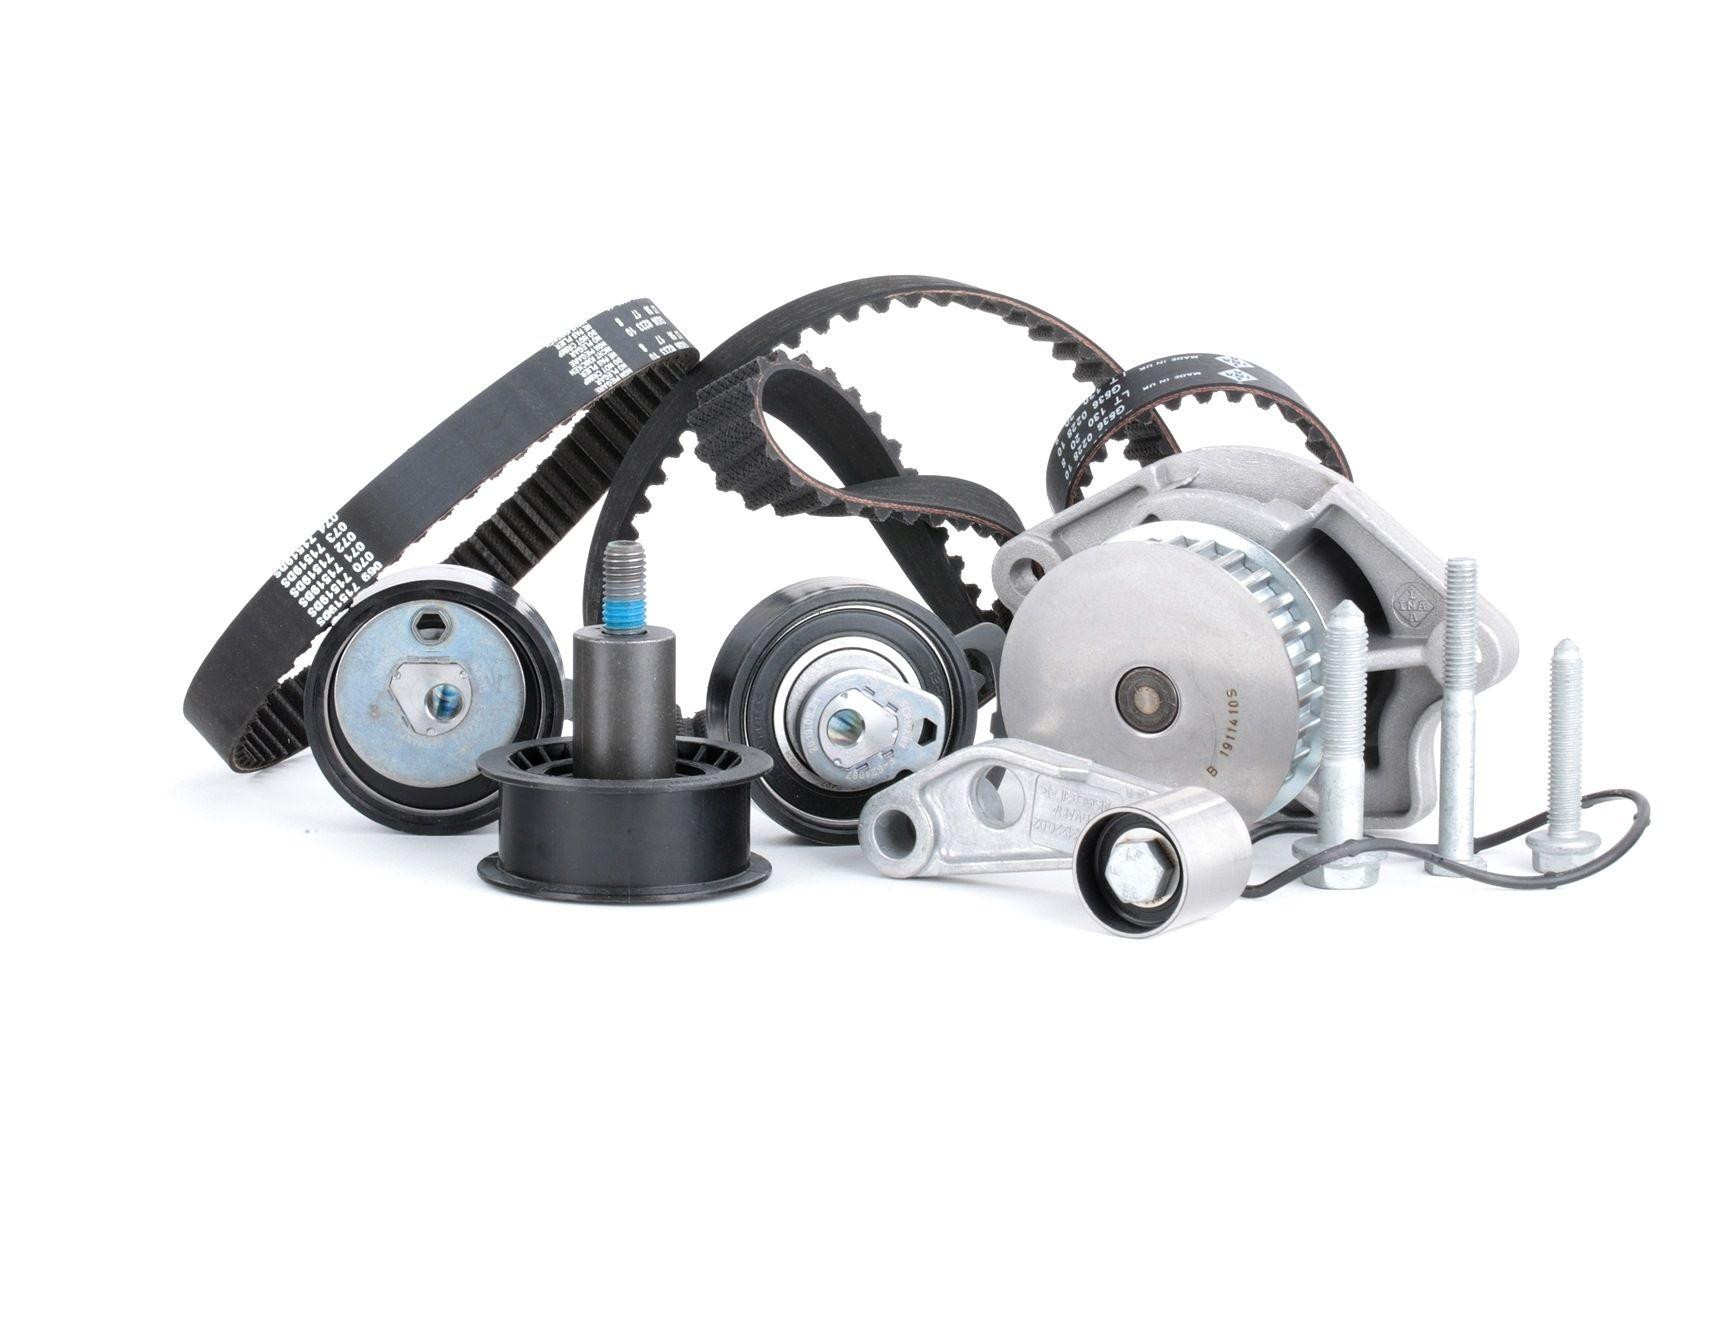 Water Pump + Timing Belt Kit INA 530 0089 31 rating